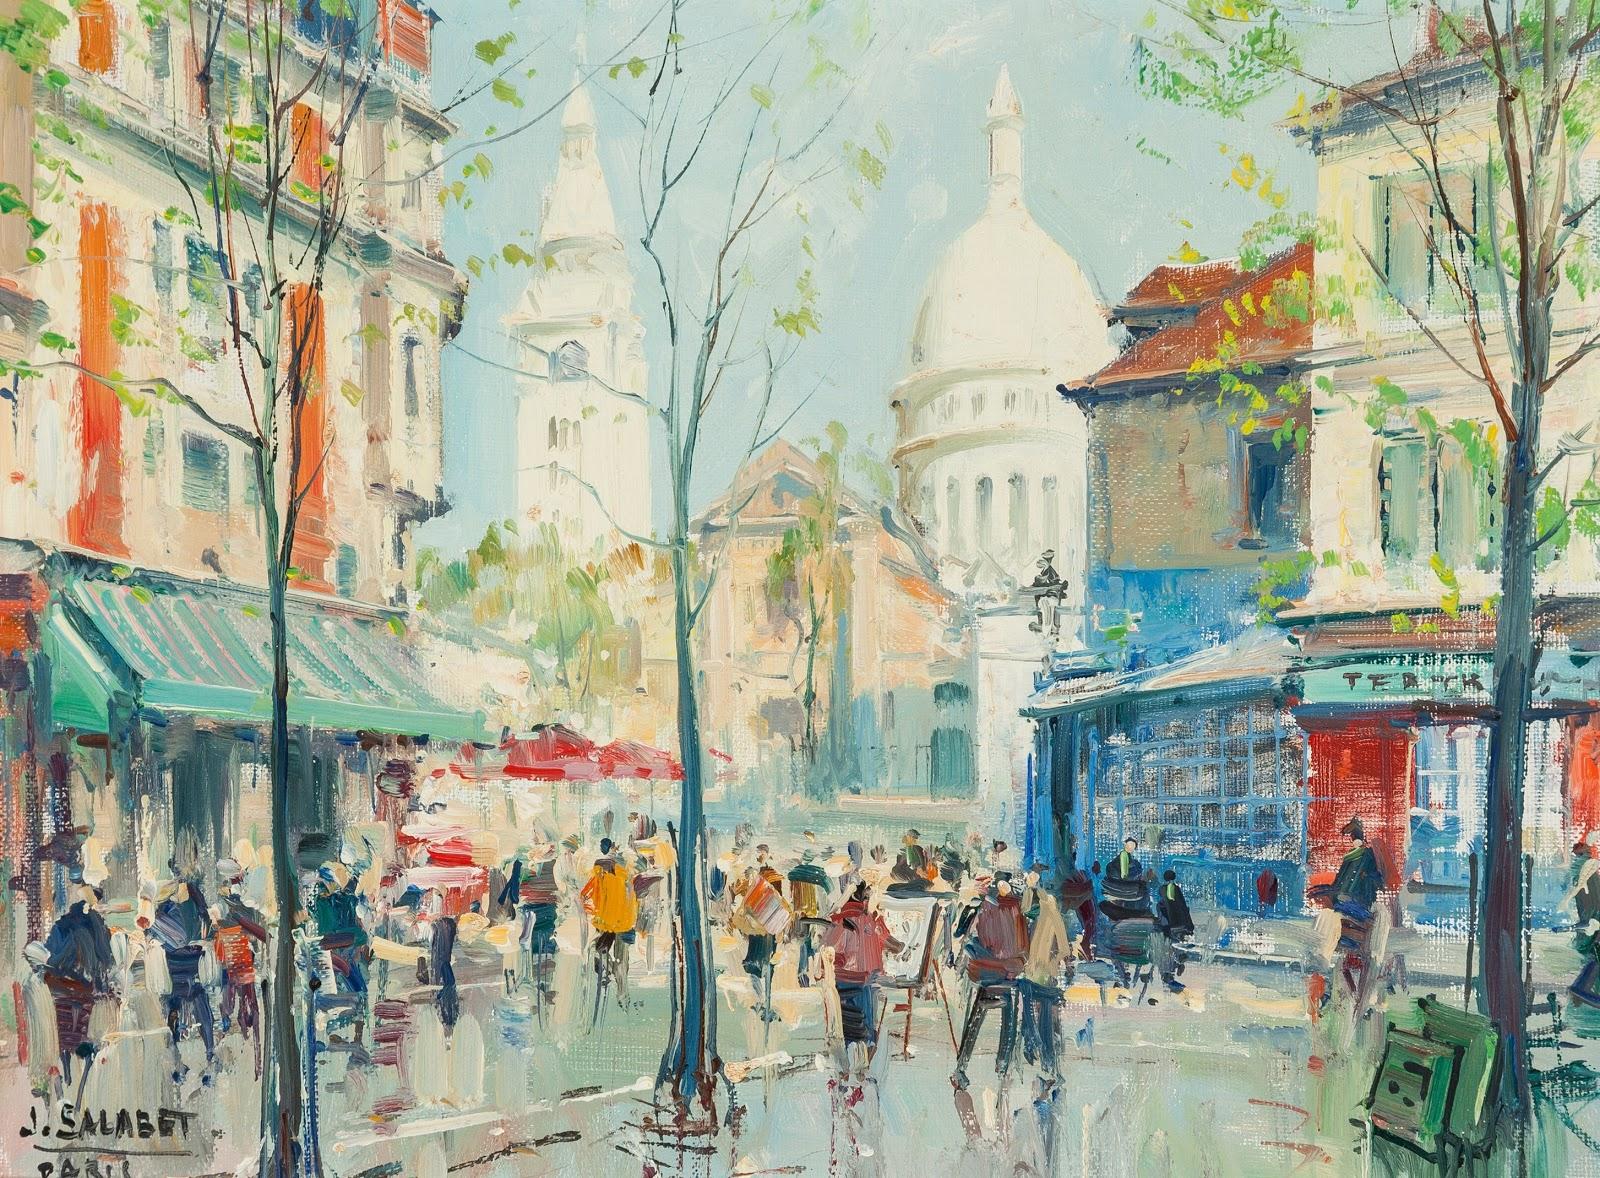 Jean Salabet Sunny Day in Paris